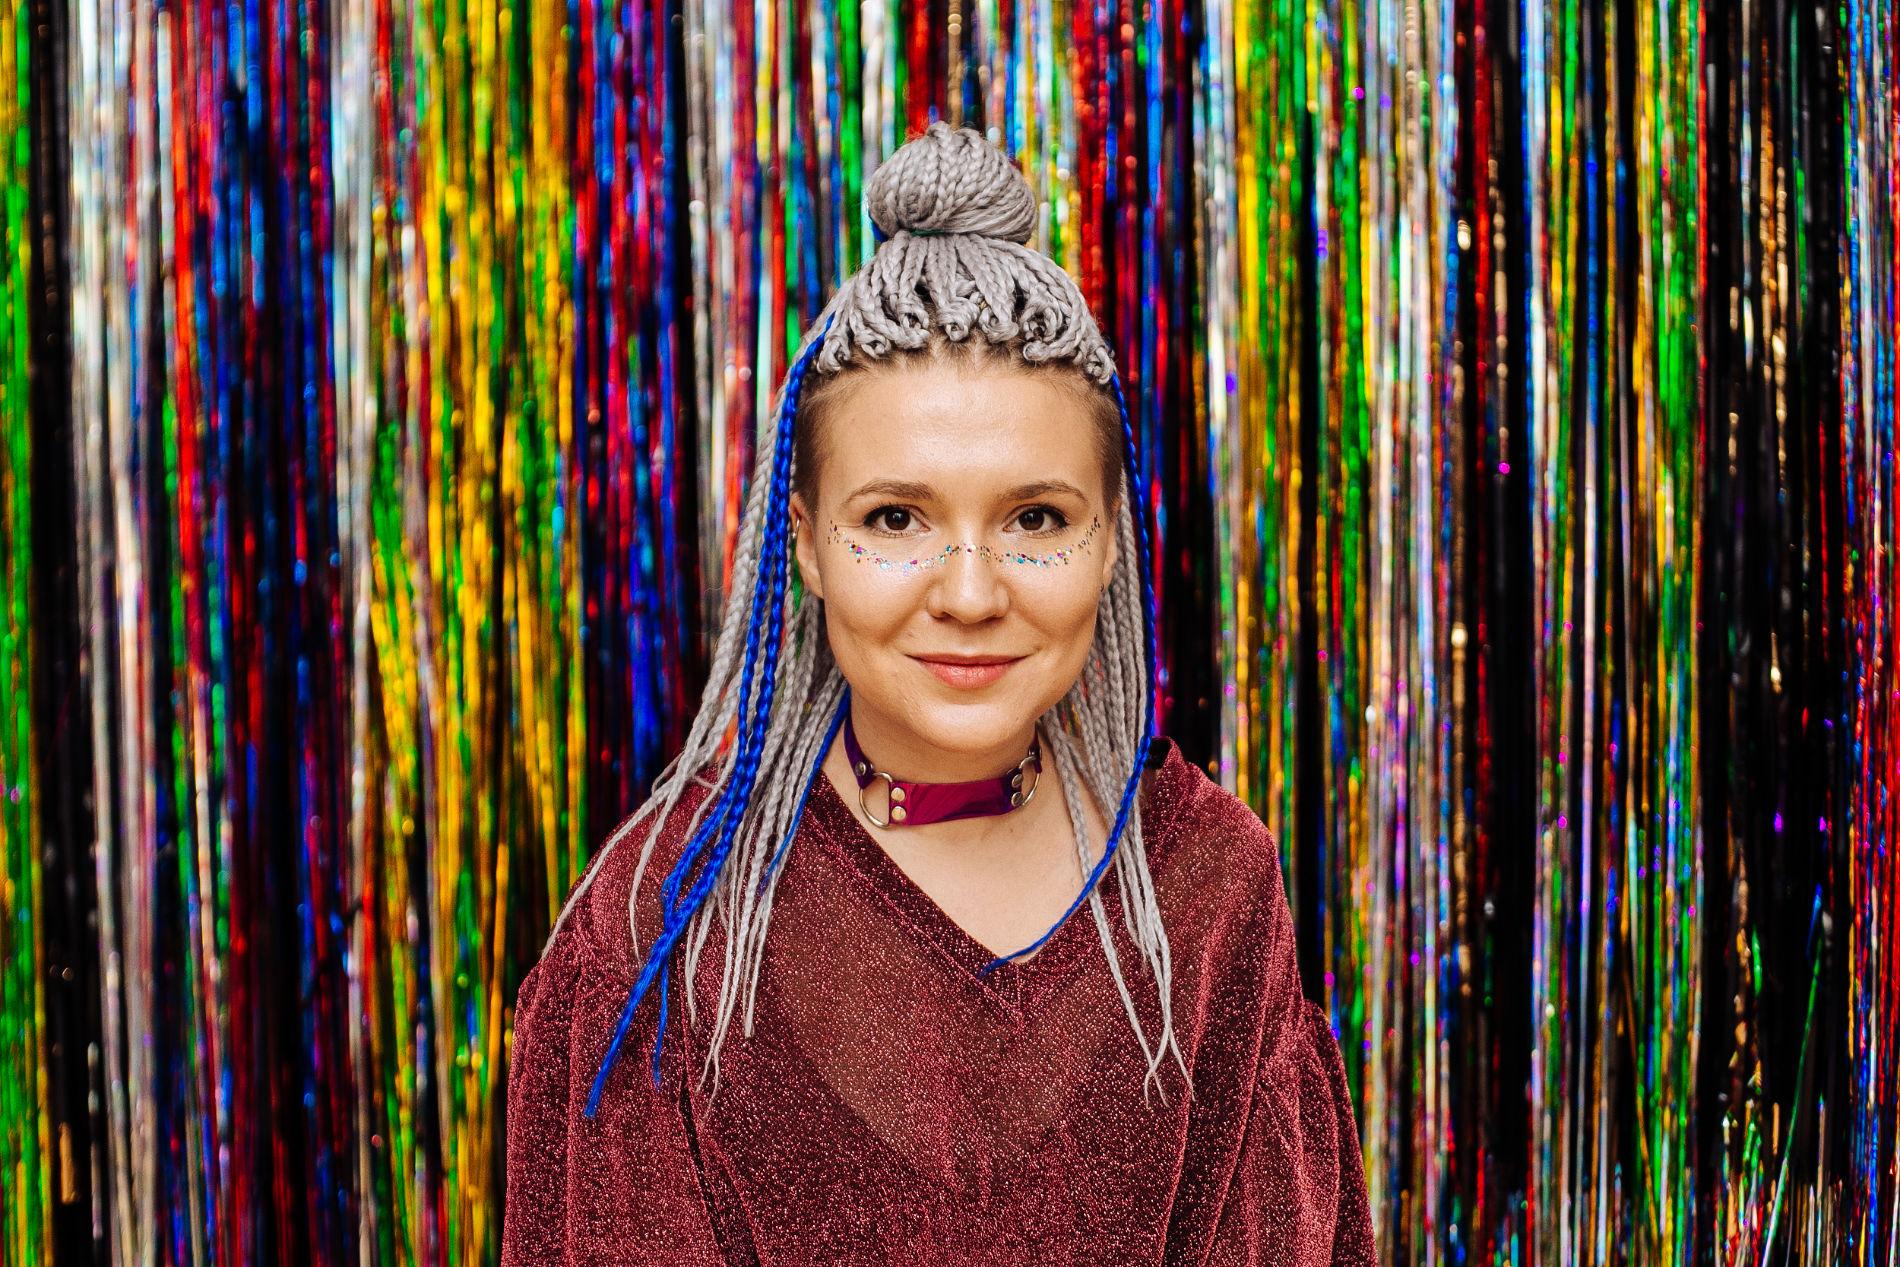 Оксана Аулова (Волуа) ©Фото из личного архива Оксаны Ауловой